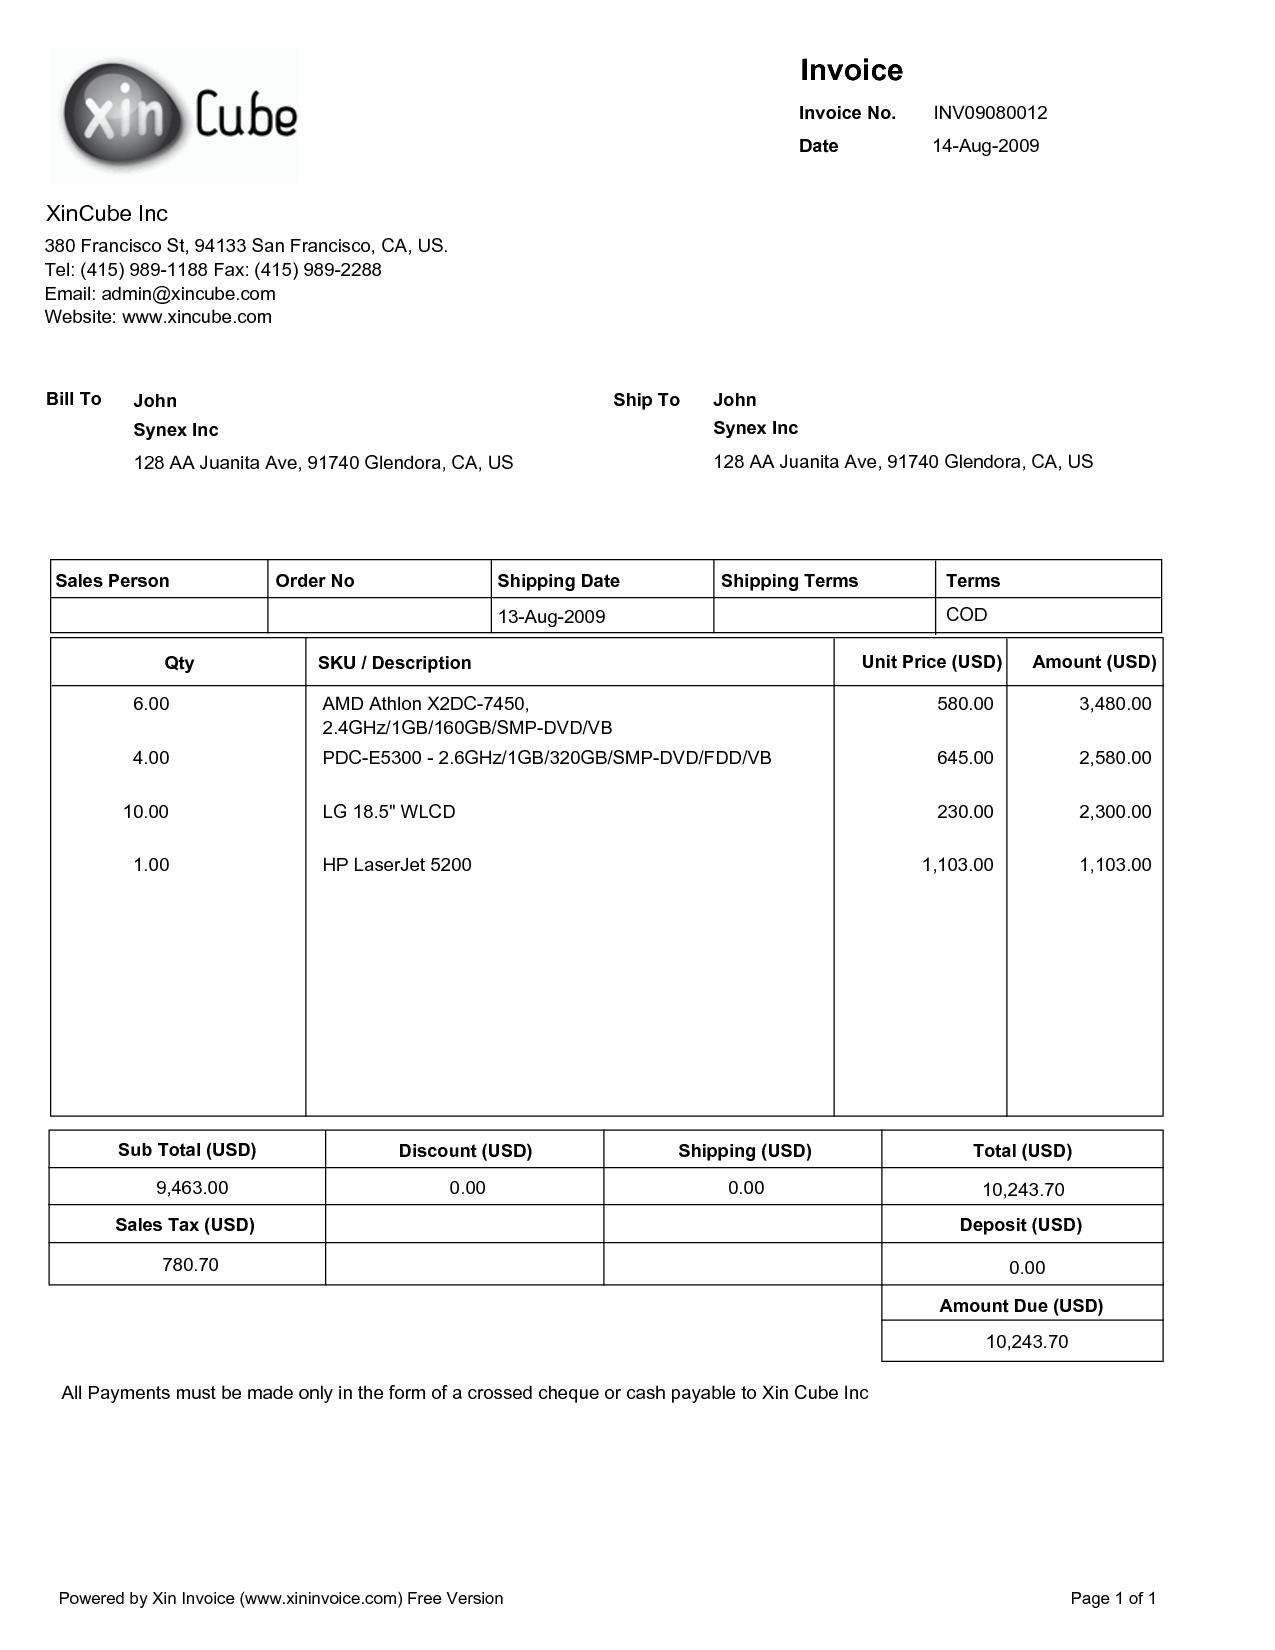 free pdf invoice template pdf invoice 13 invoice template pdf invoice template download 1275 X 1650